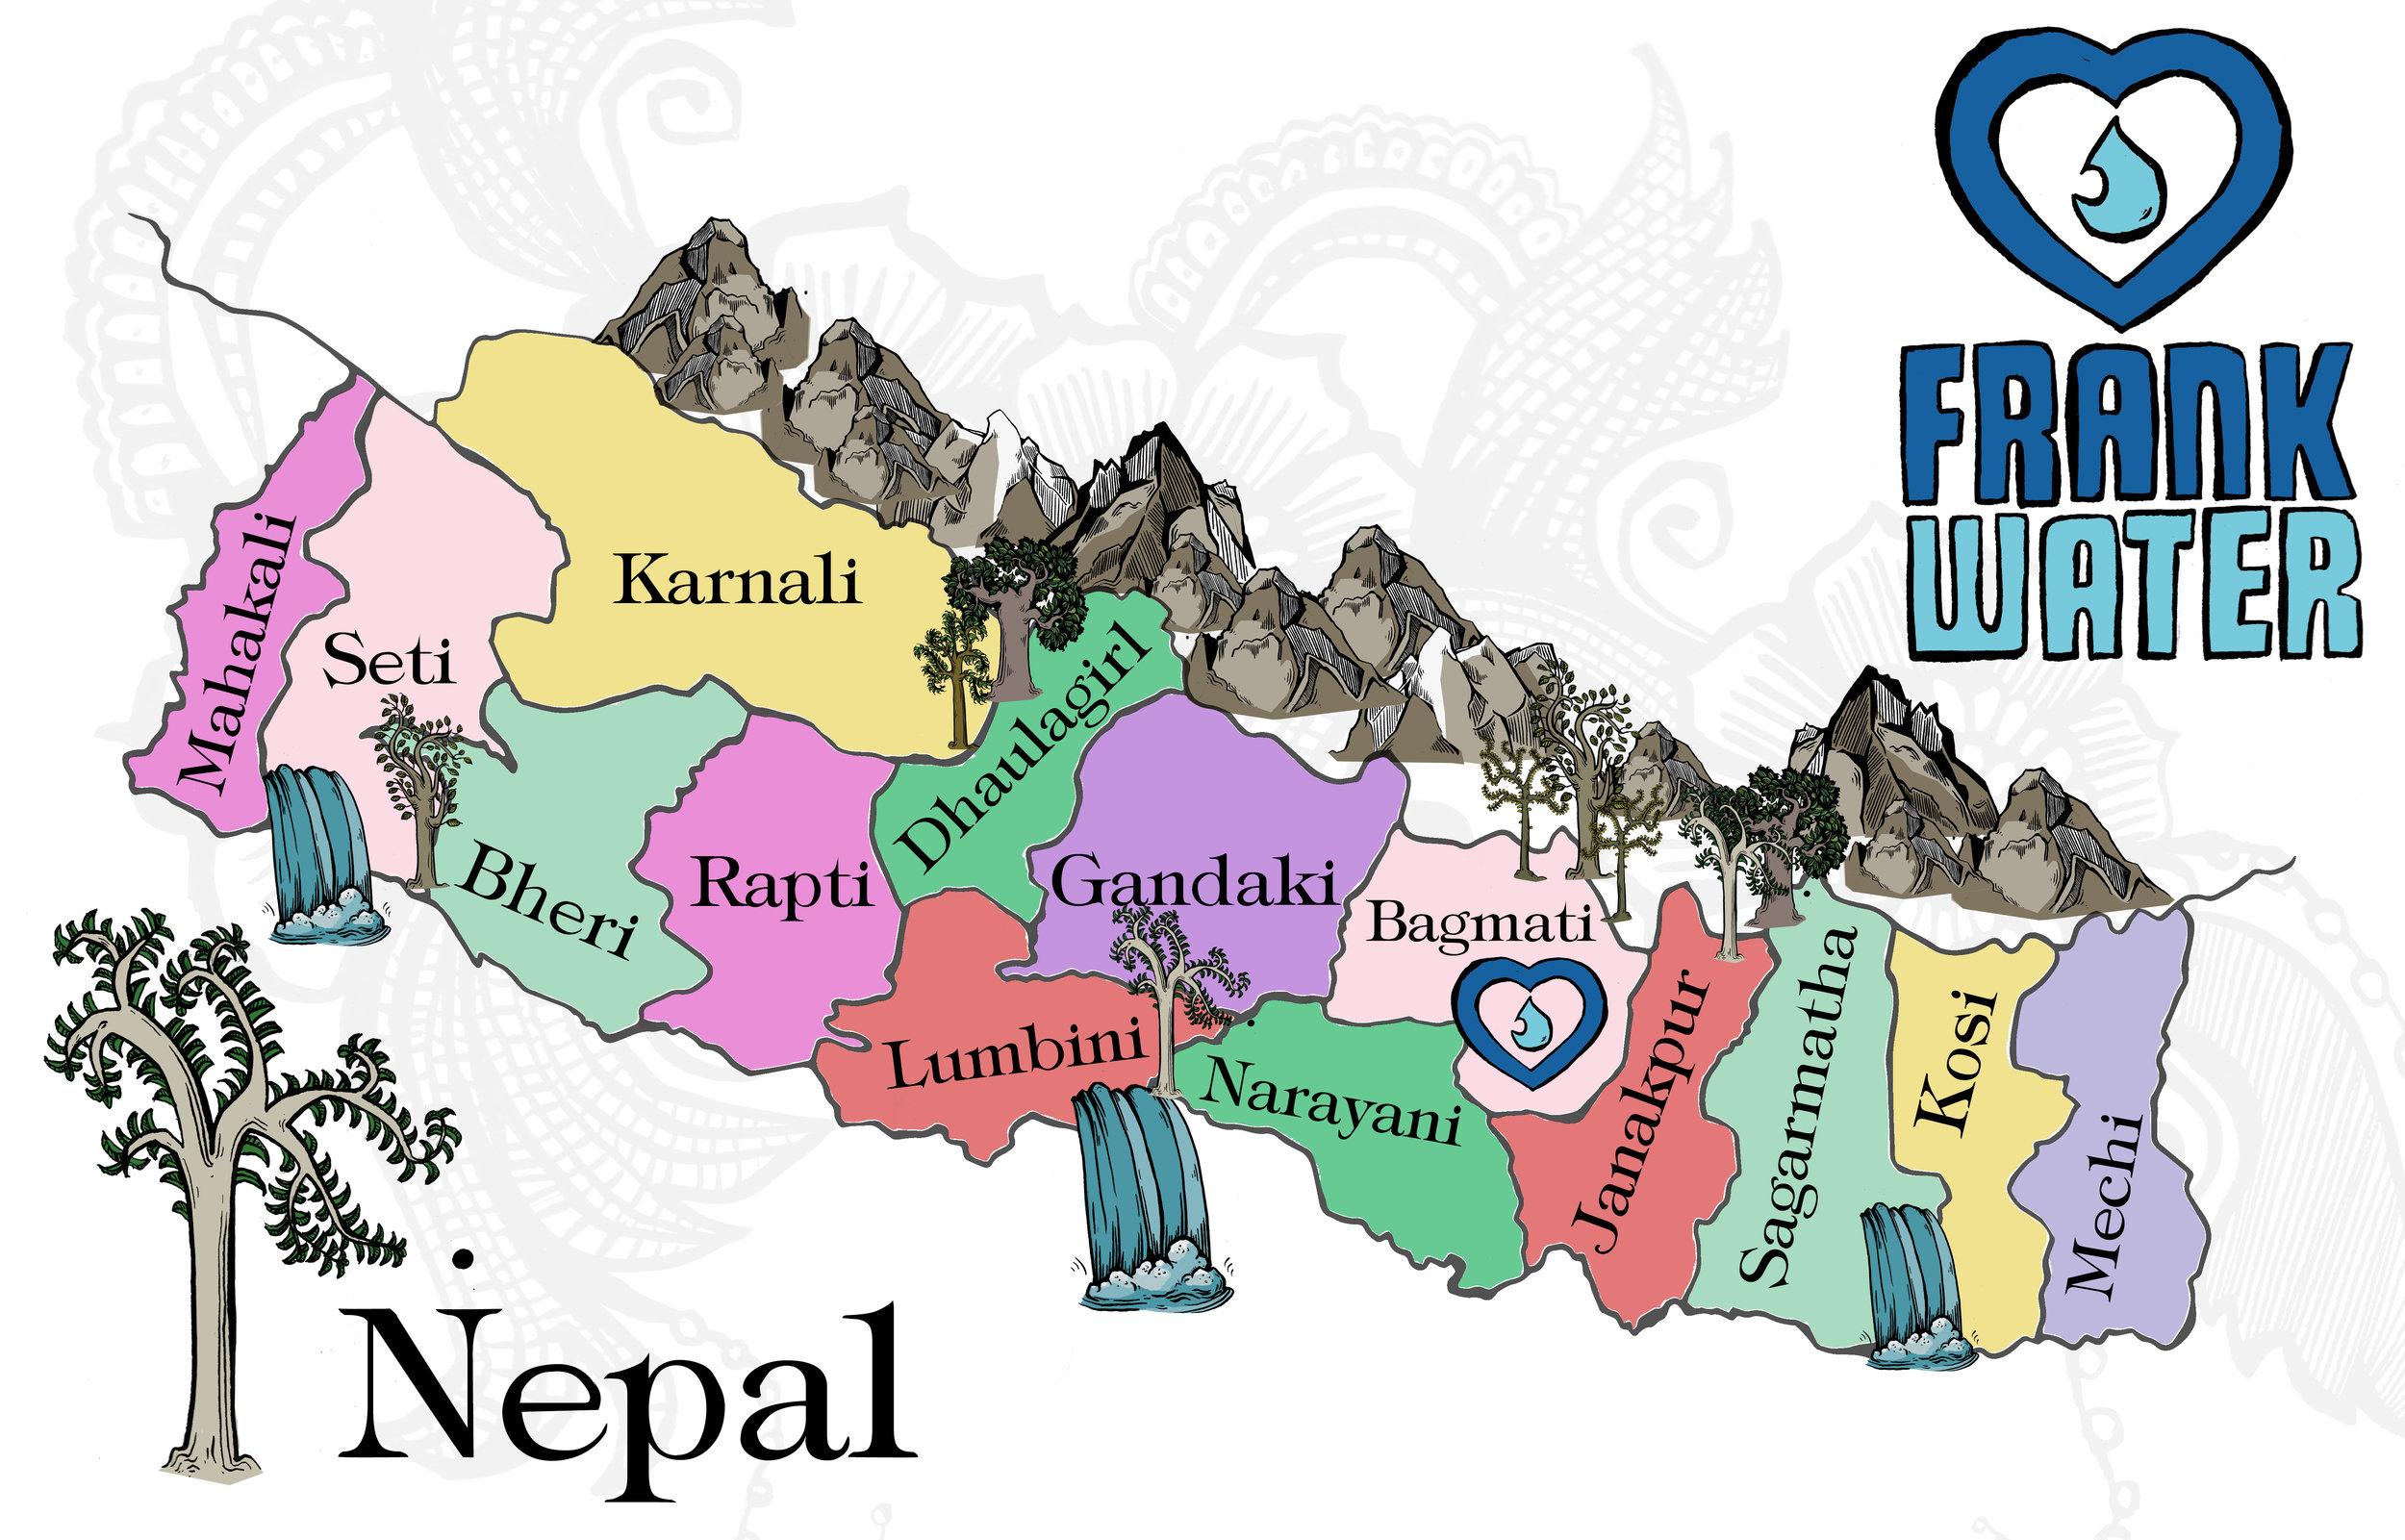 NEPALmap2.jpg